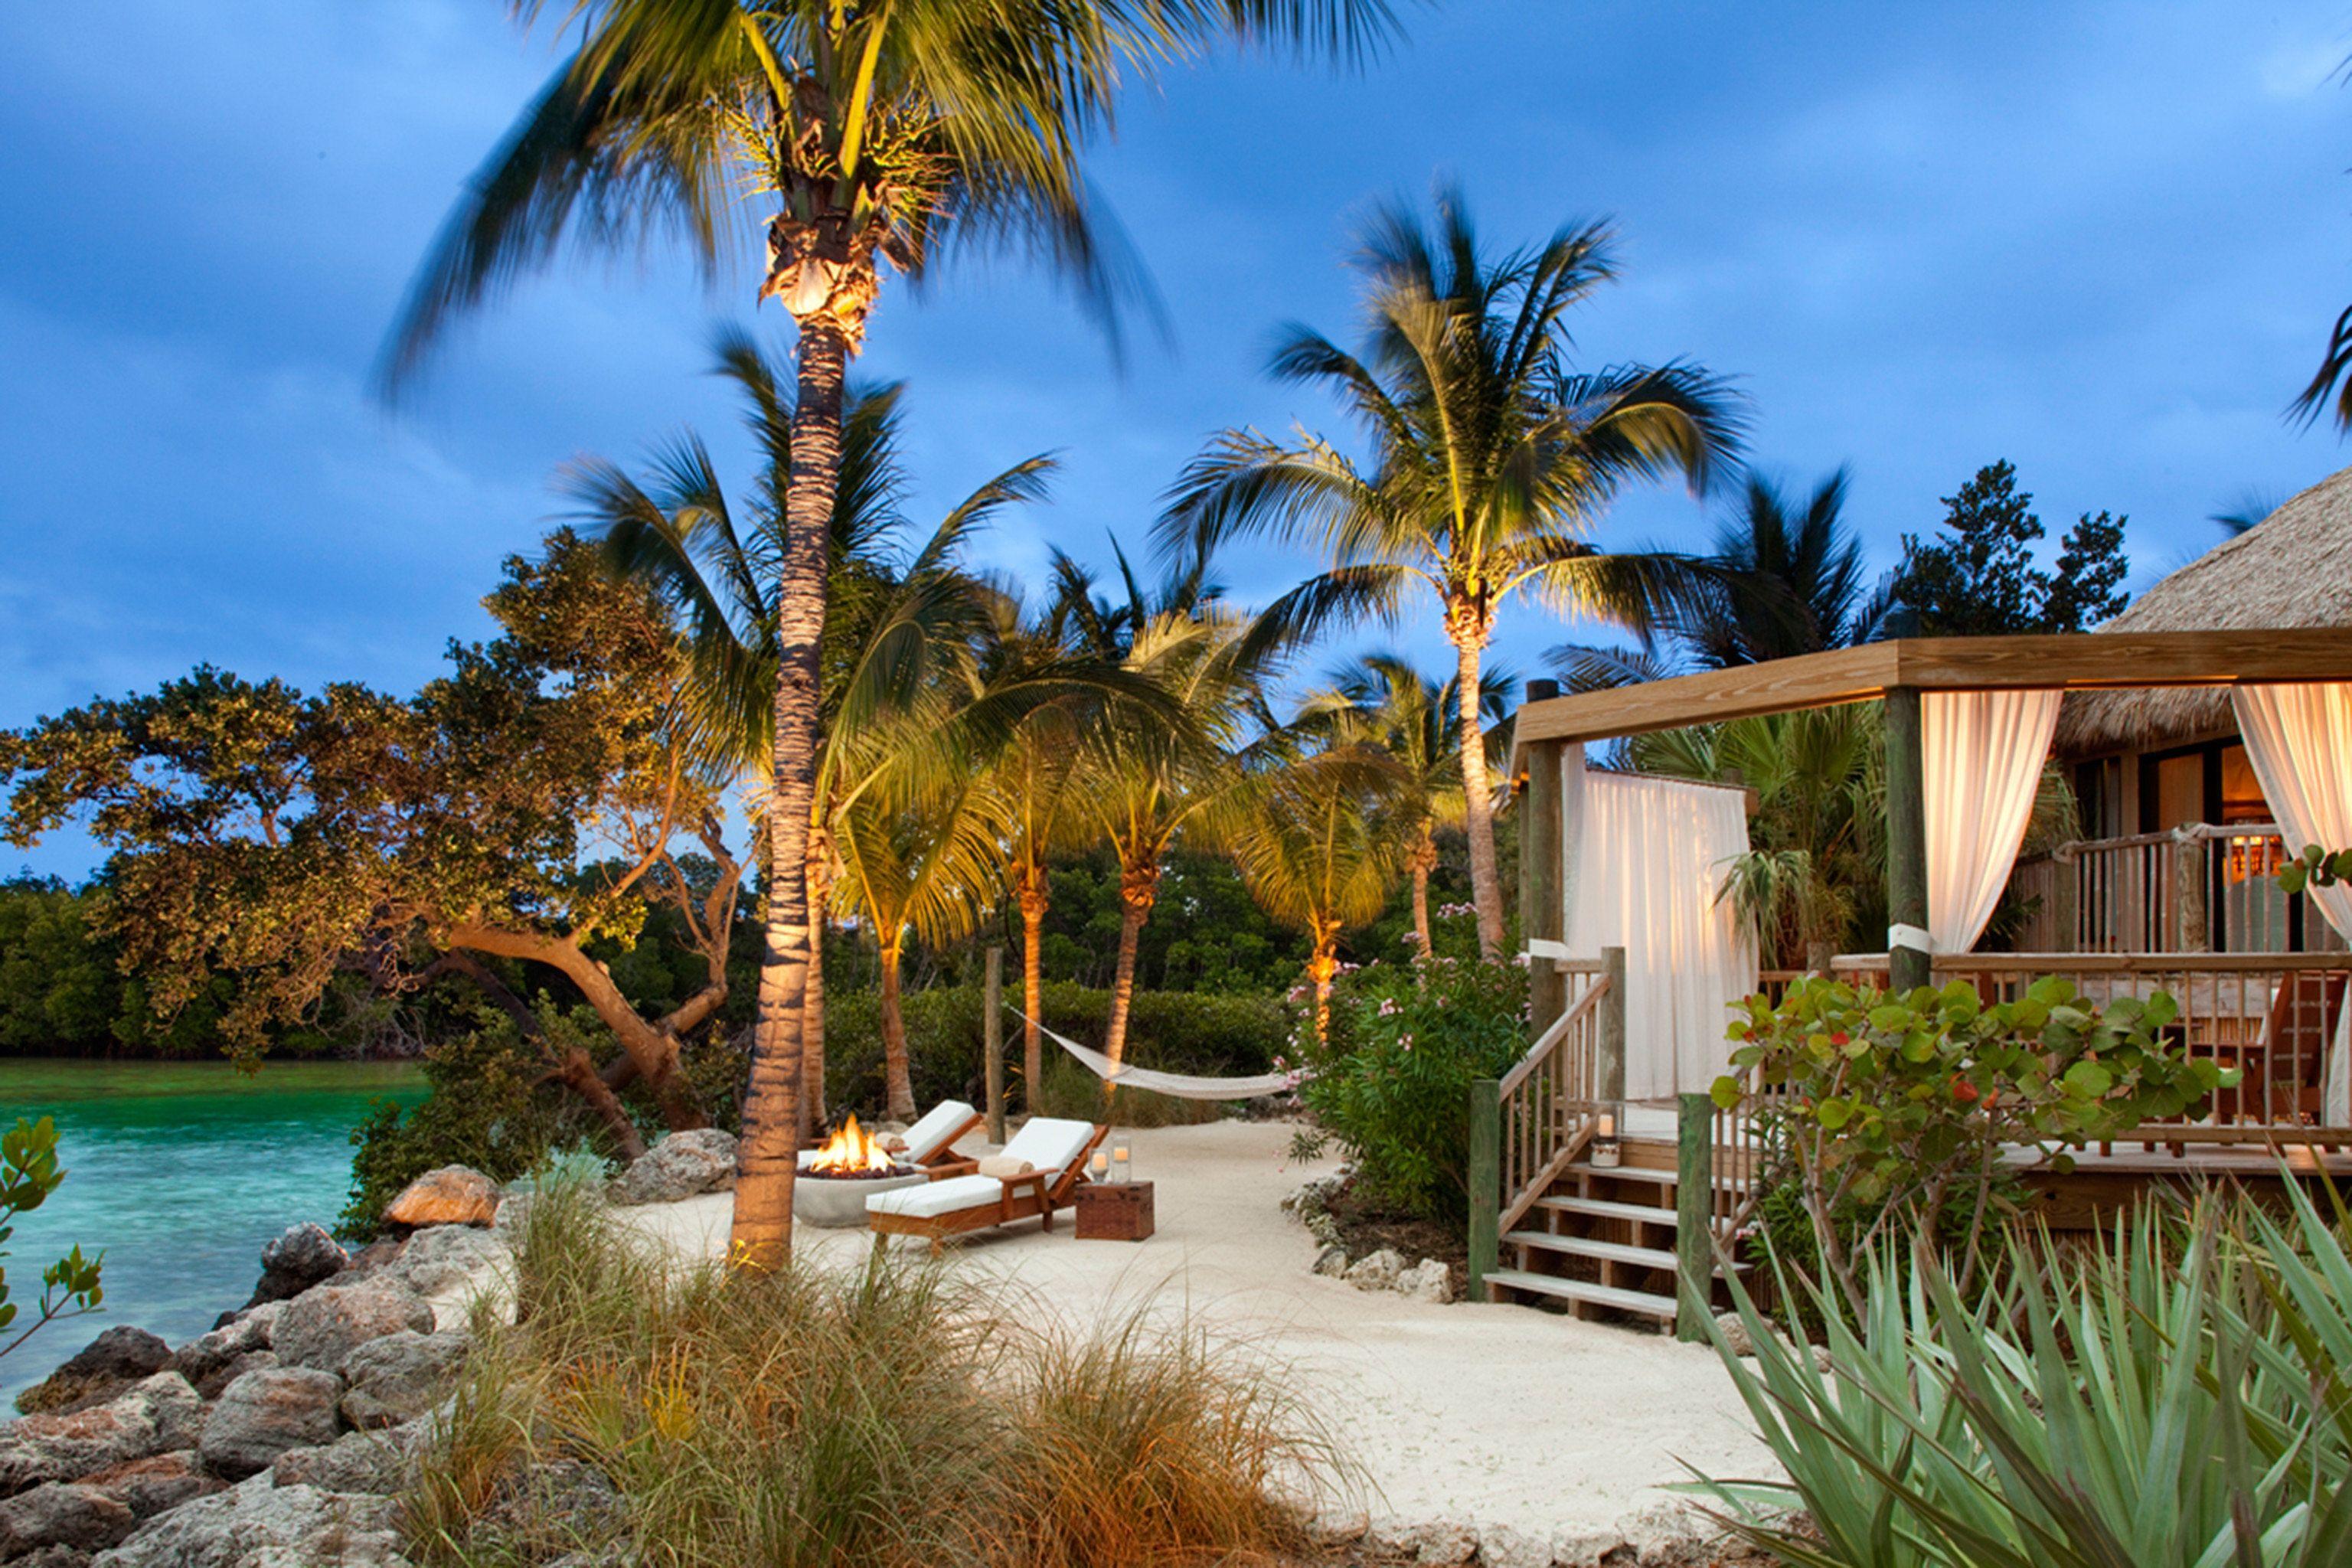 Beach Beachfront Hotels Island Outdoors Resort Romance Romantic Trip Ideas